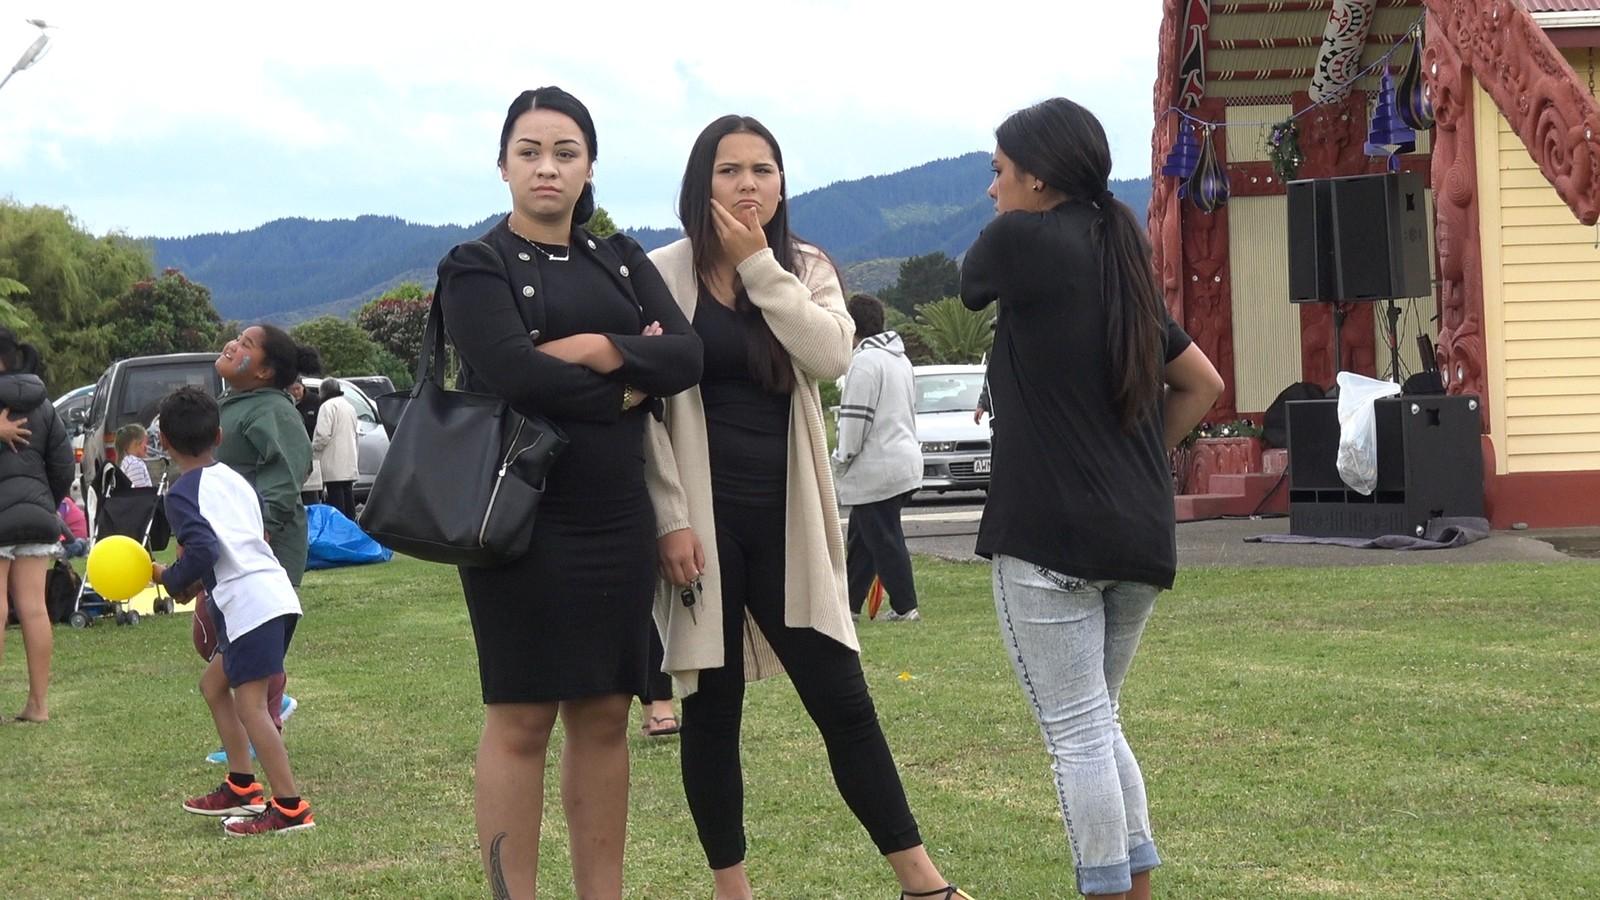 Maori-nuorat olggobealde iežaset deaivvadanbáikki, Te Kahas, Aoteroas. / Maoriungdom utenfor deres faste møteplass i Te Kaha på New Zealand.